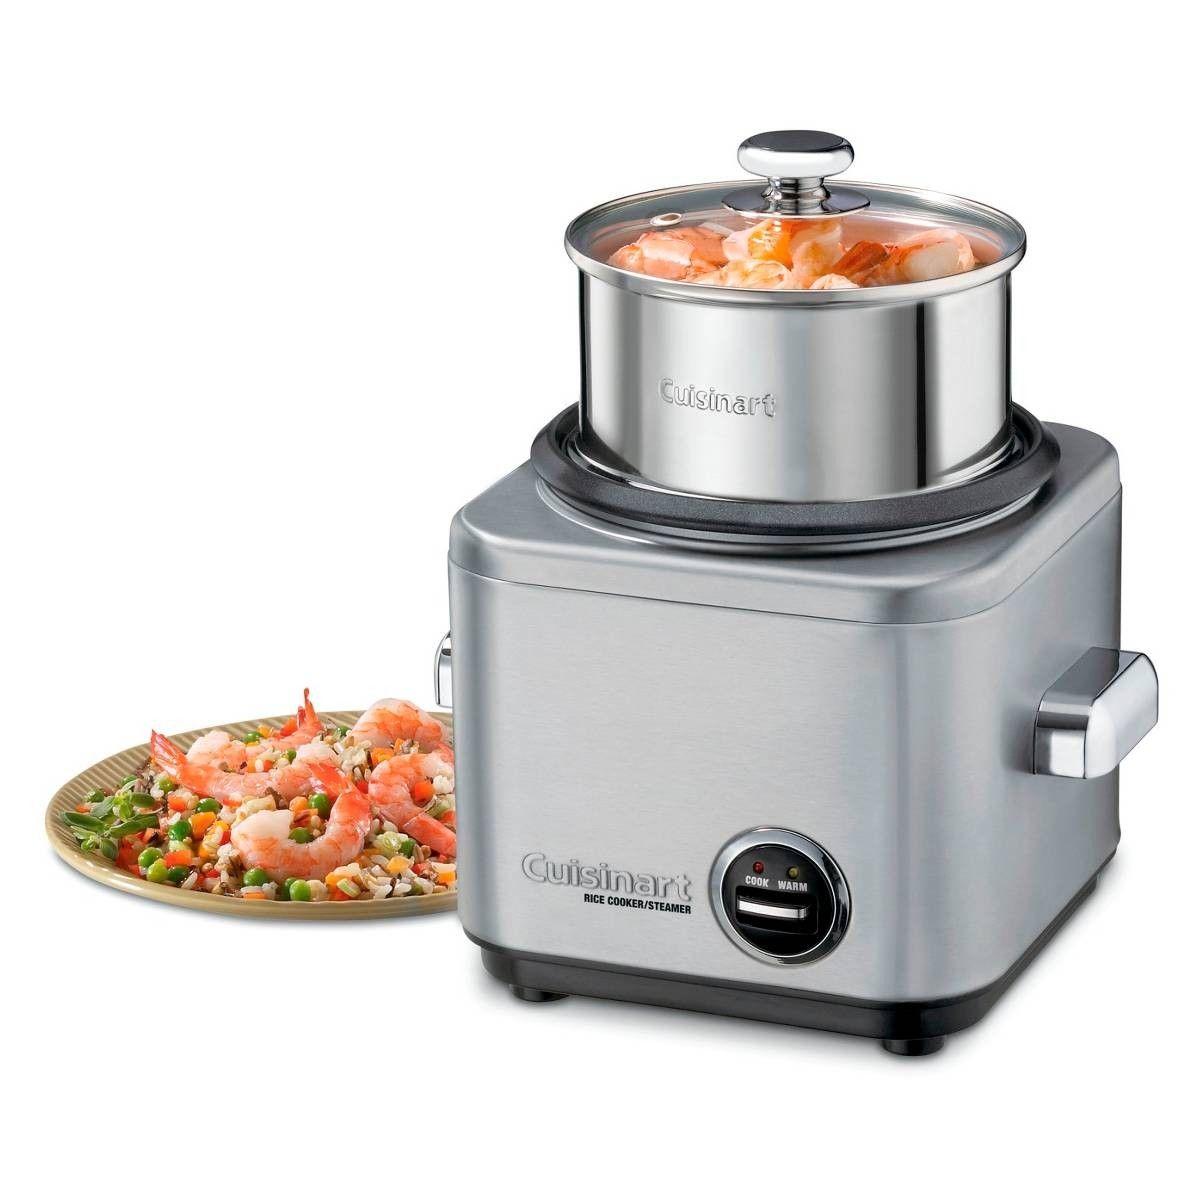 Cuisinart rice cooker cuisinart rice cooker stainless